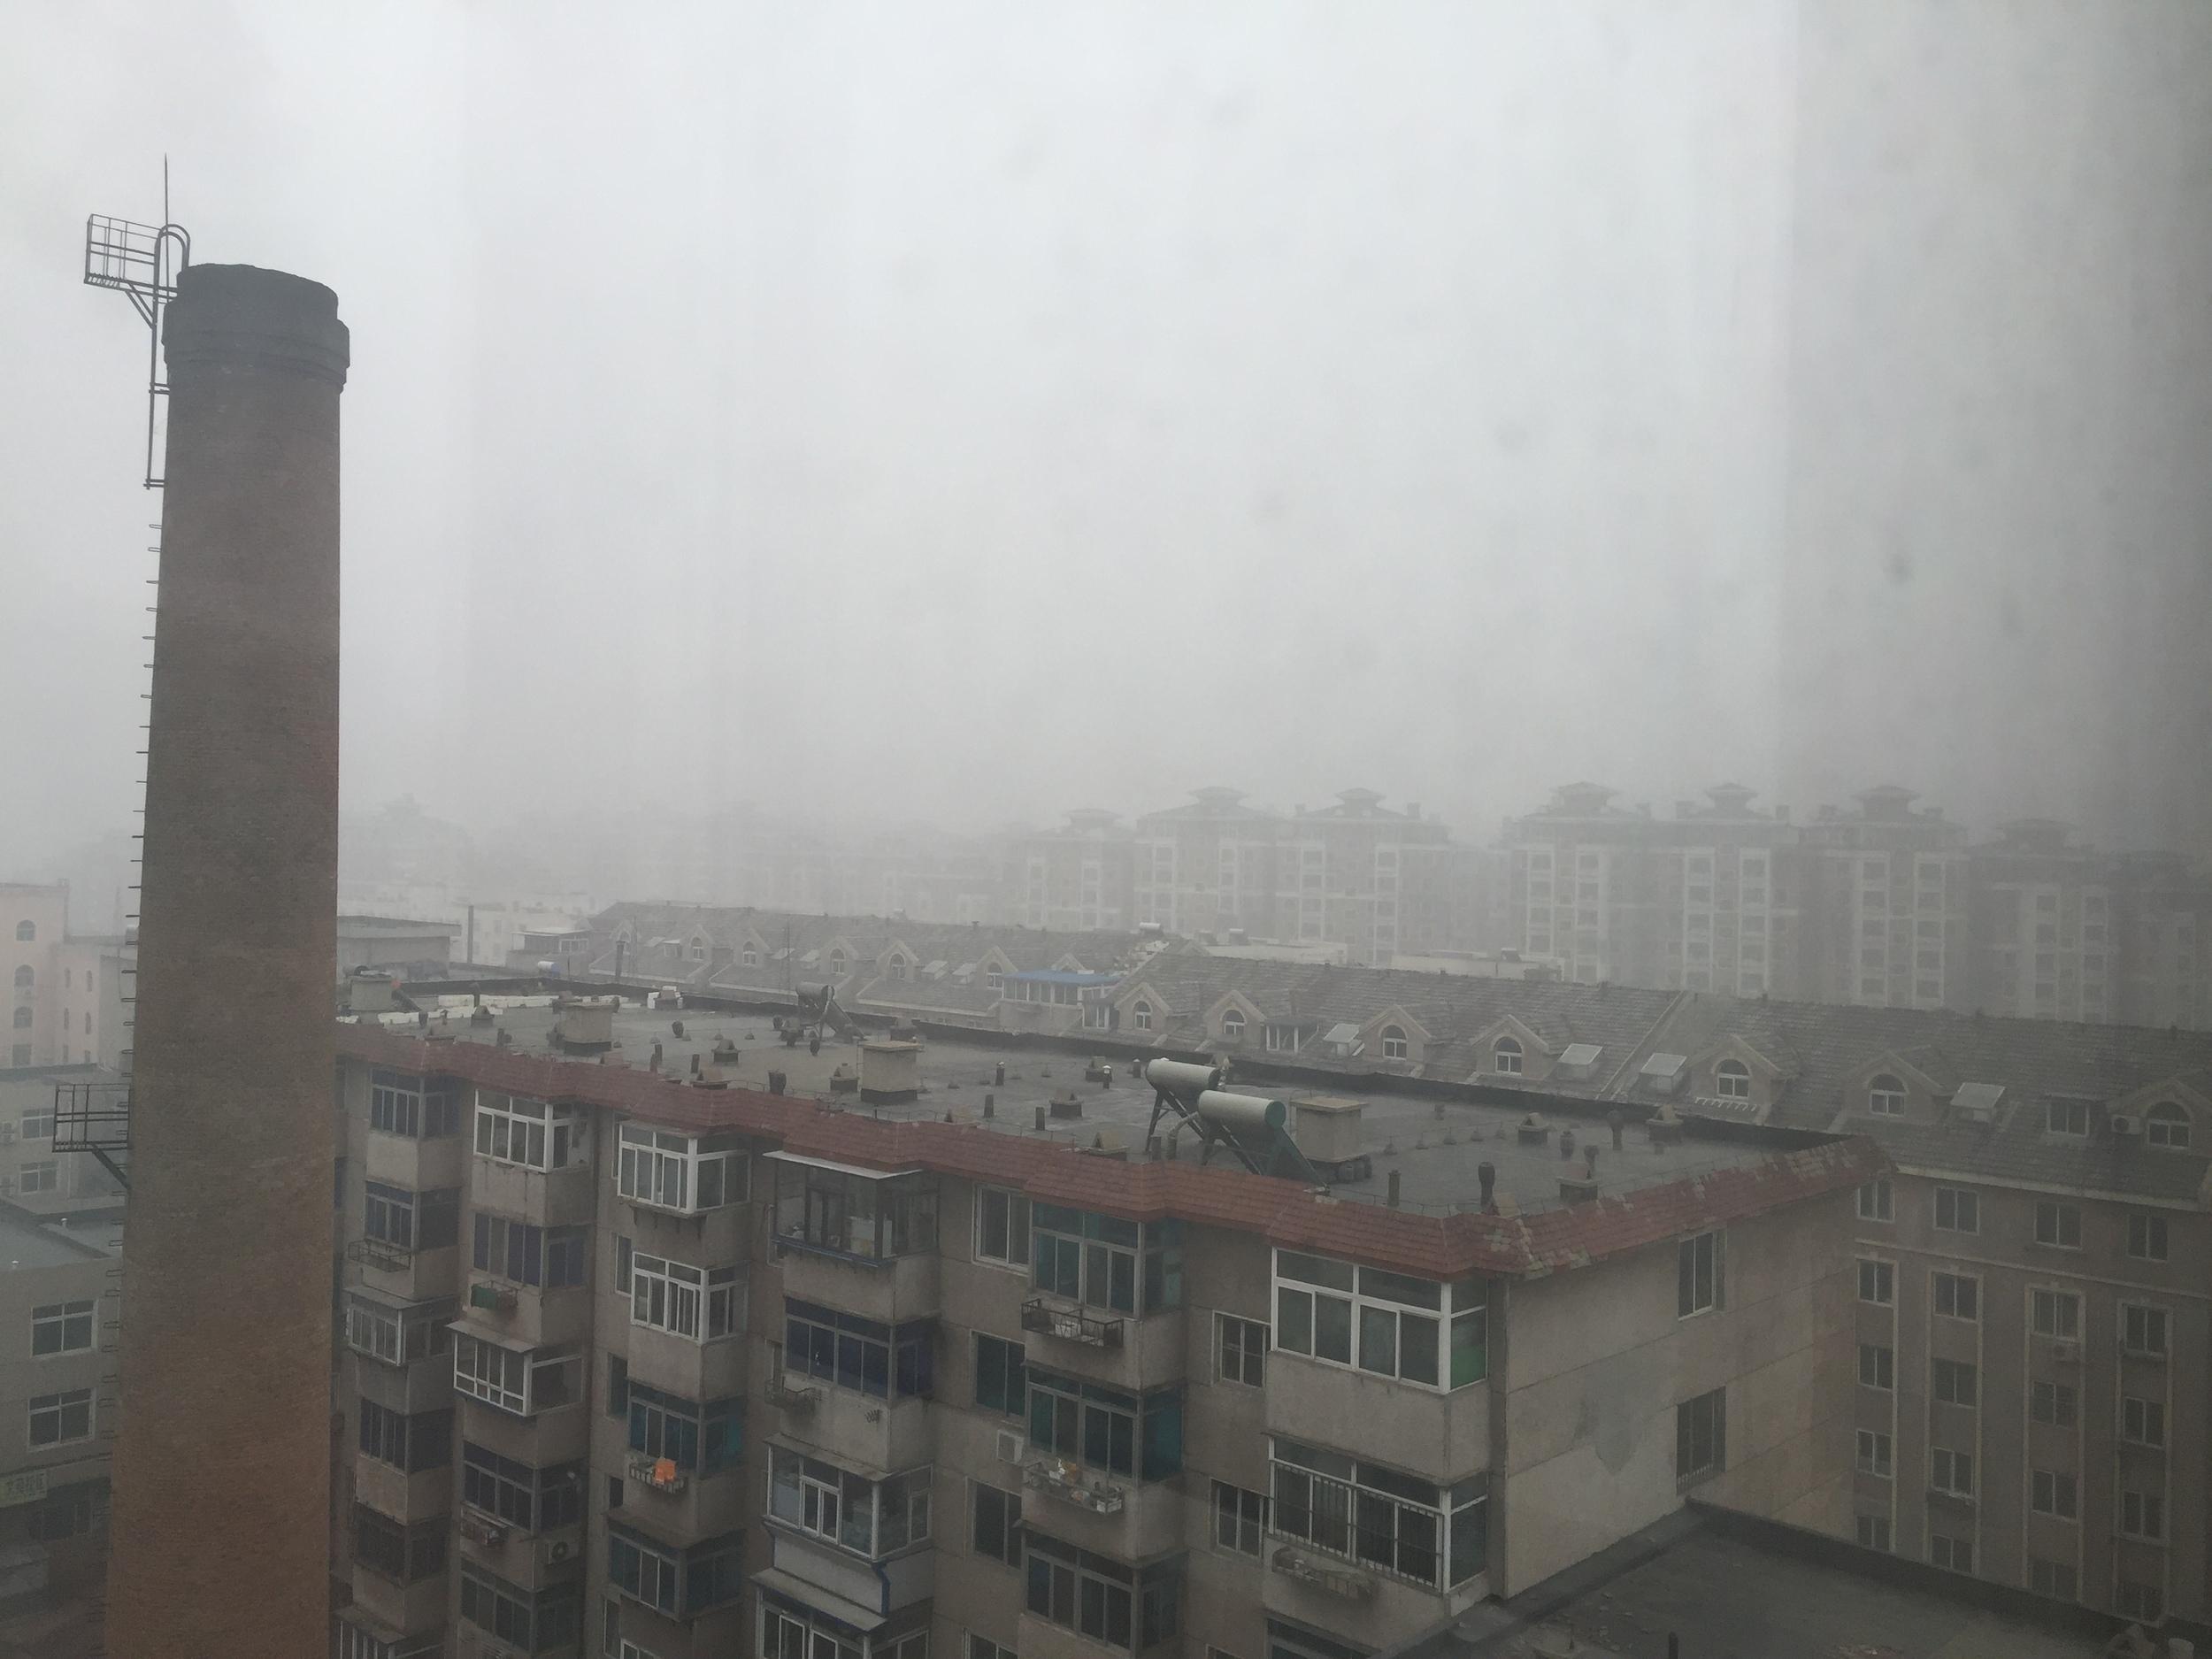 On a bad smog day.